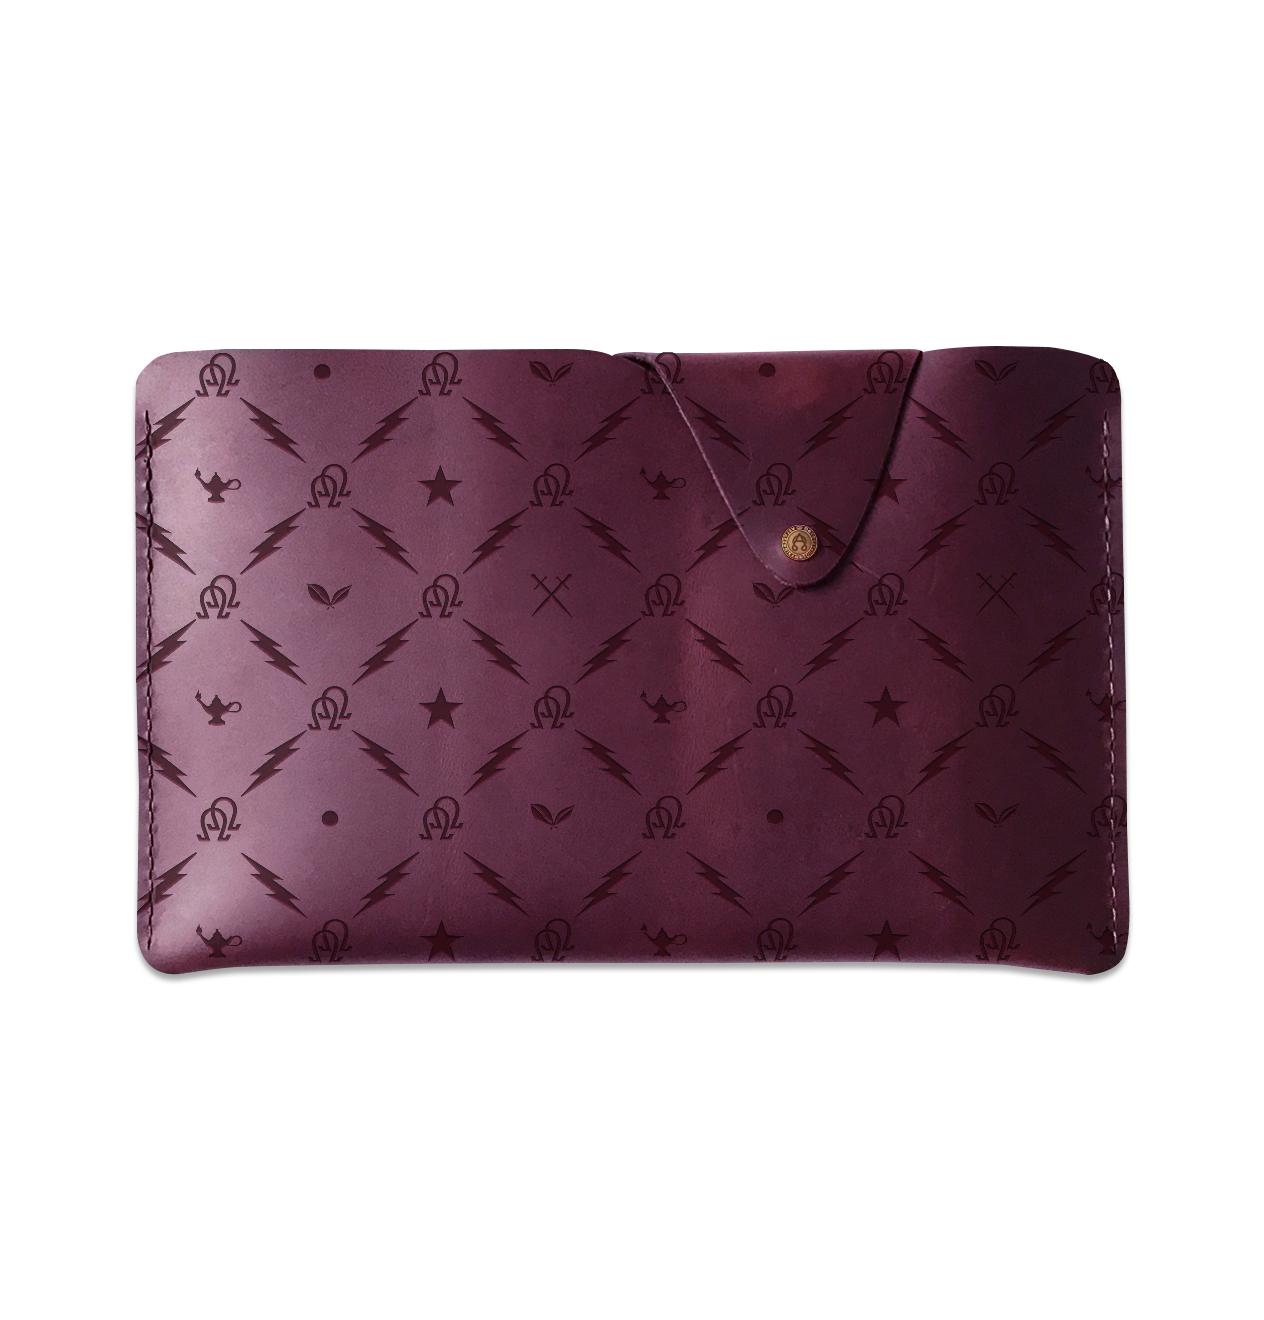 Omega-Psi-Phi---Labtop-Carrier---Purple.png